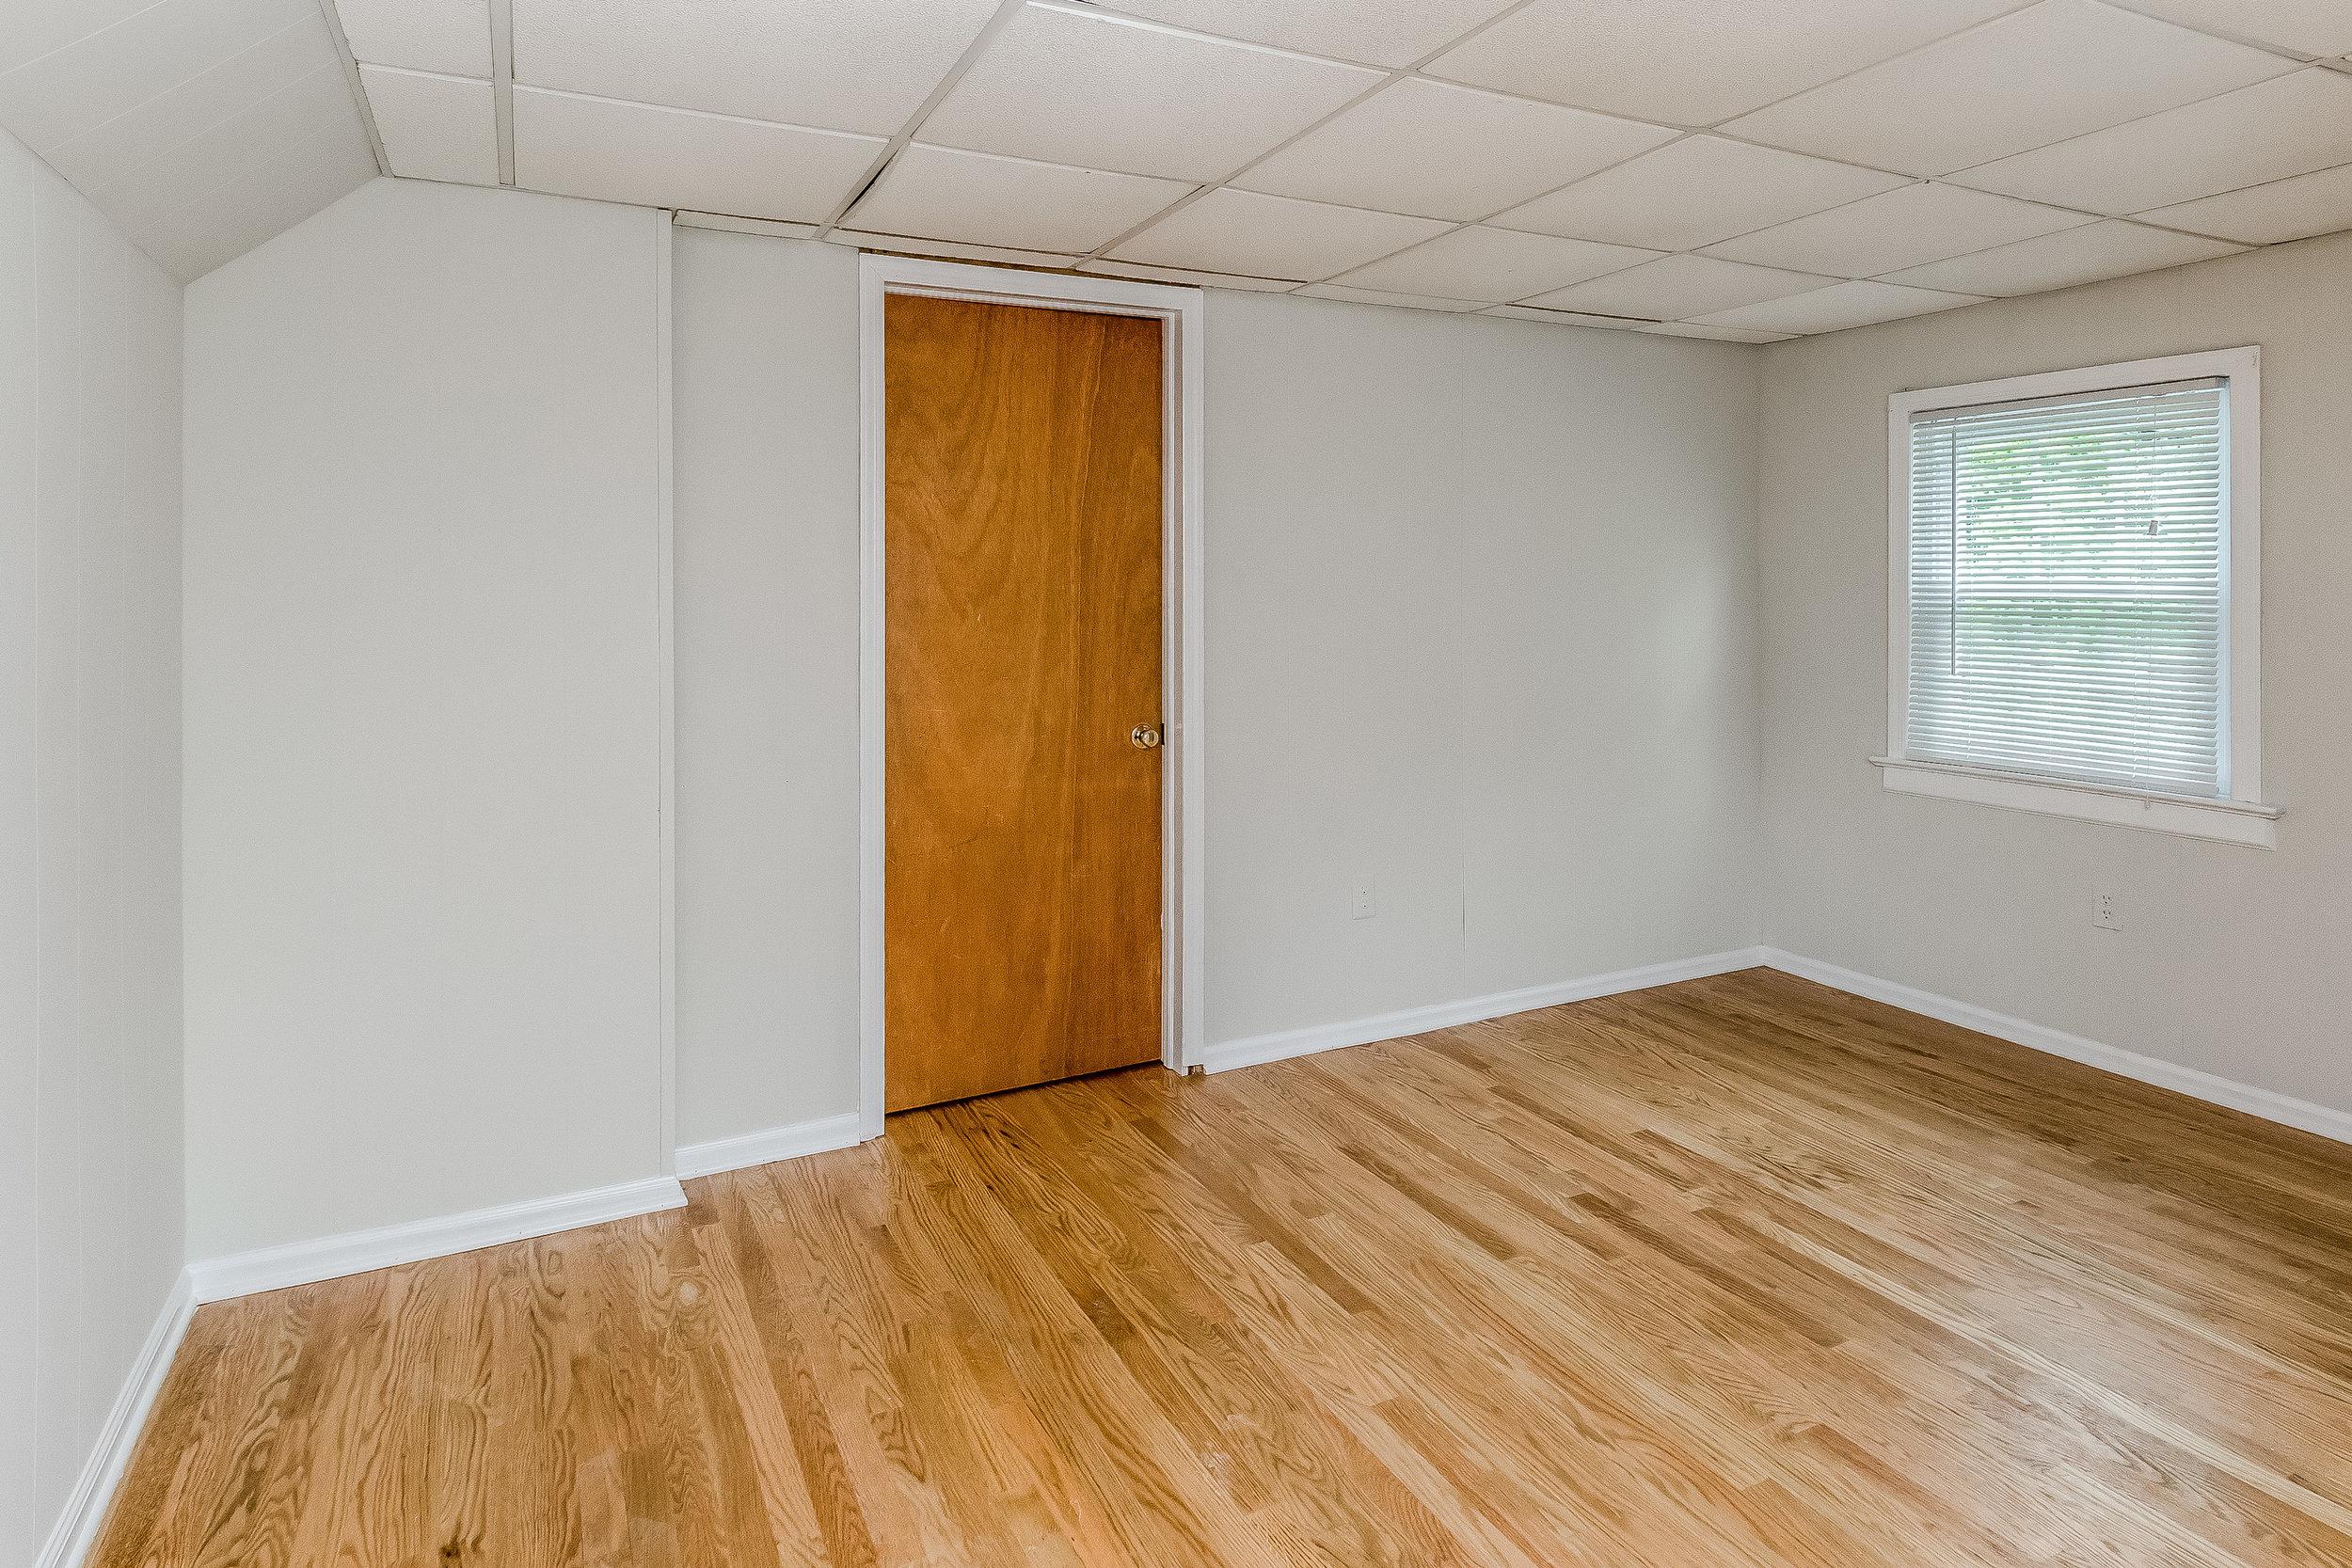 030-photo-master-bedroom-5786568.jpg